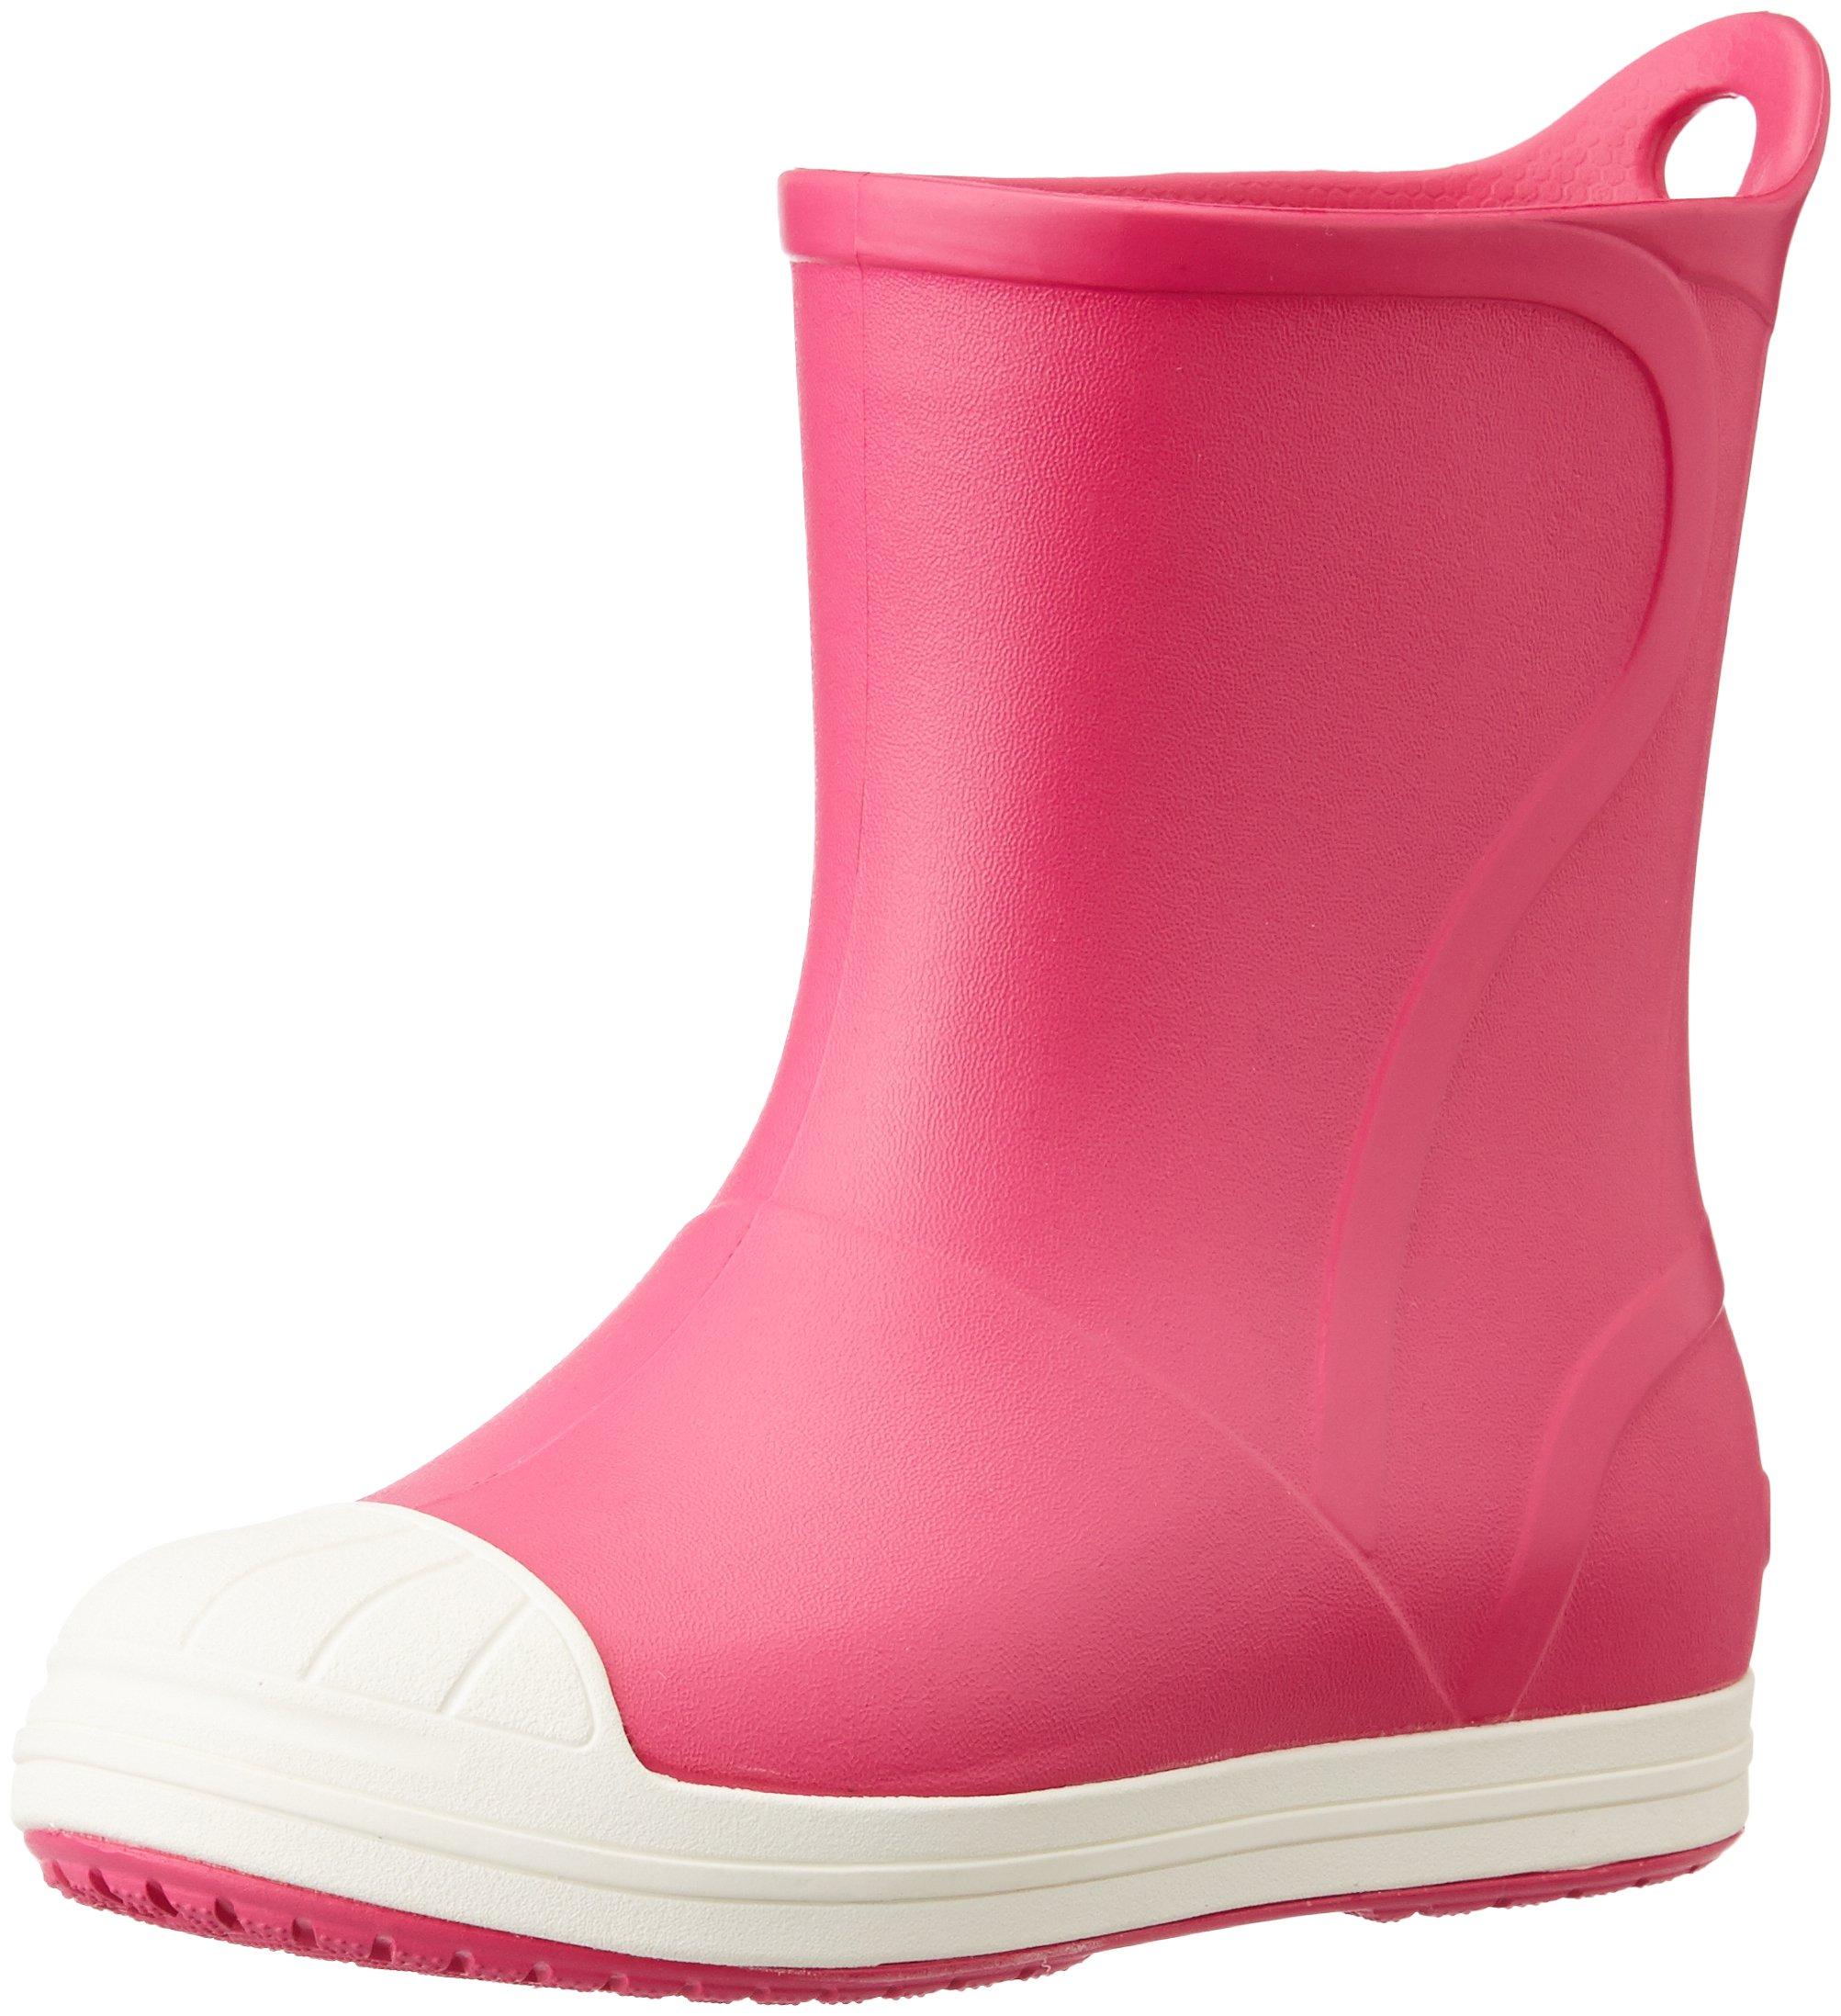 Crocs Bump It Rain Boot (Toddler/Little Kid), Candy Pink/Oyster, 7 M US Toddler